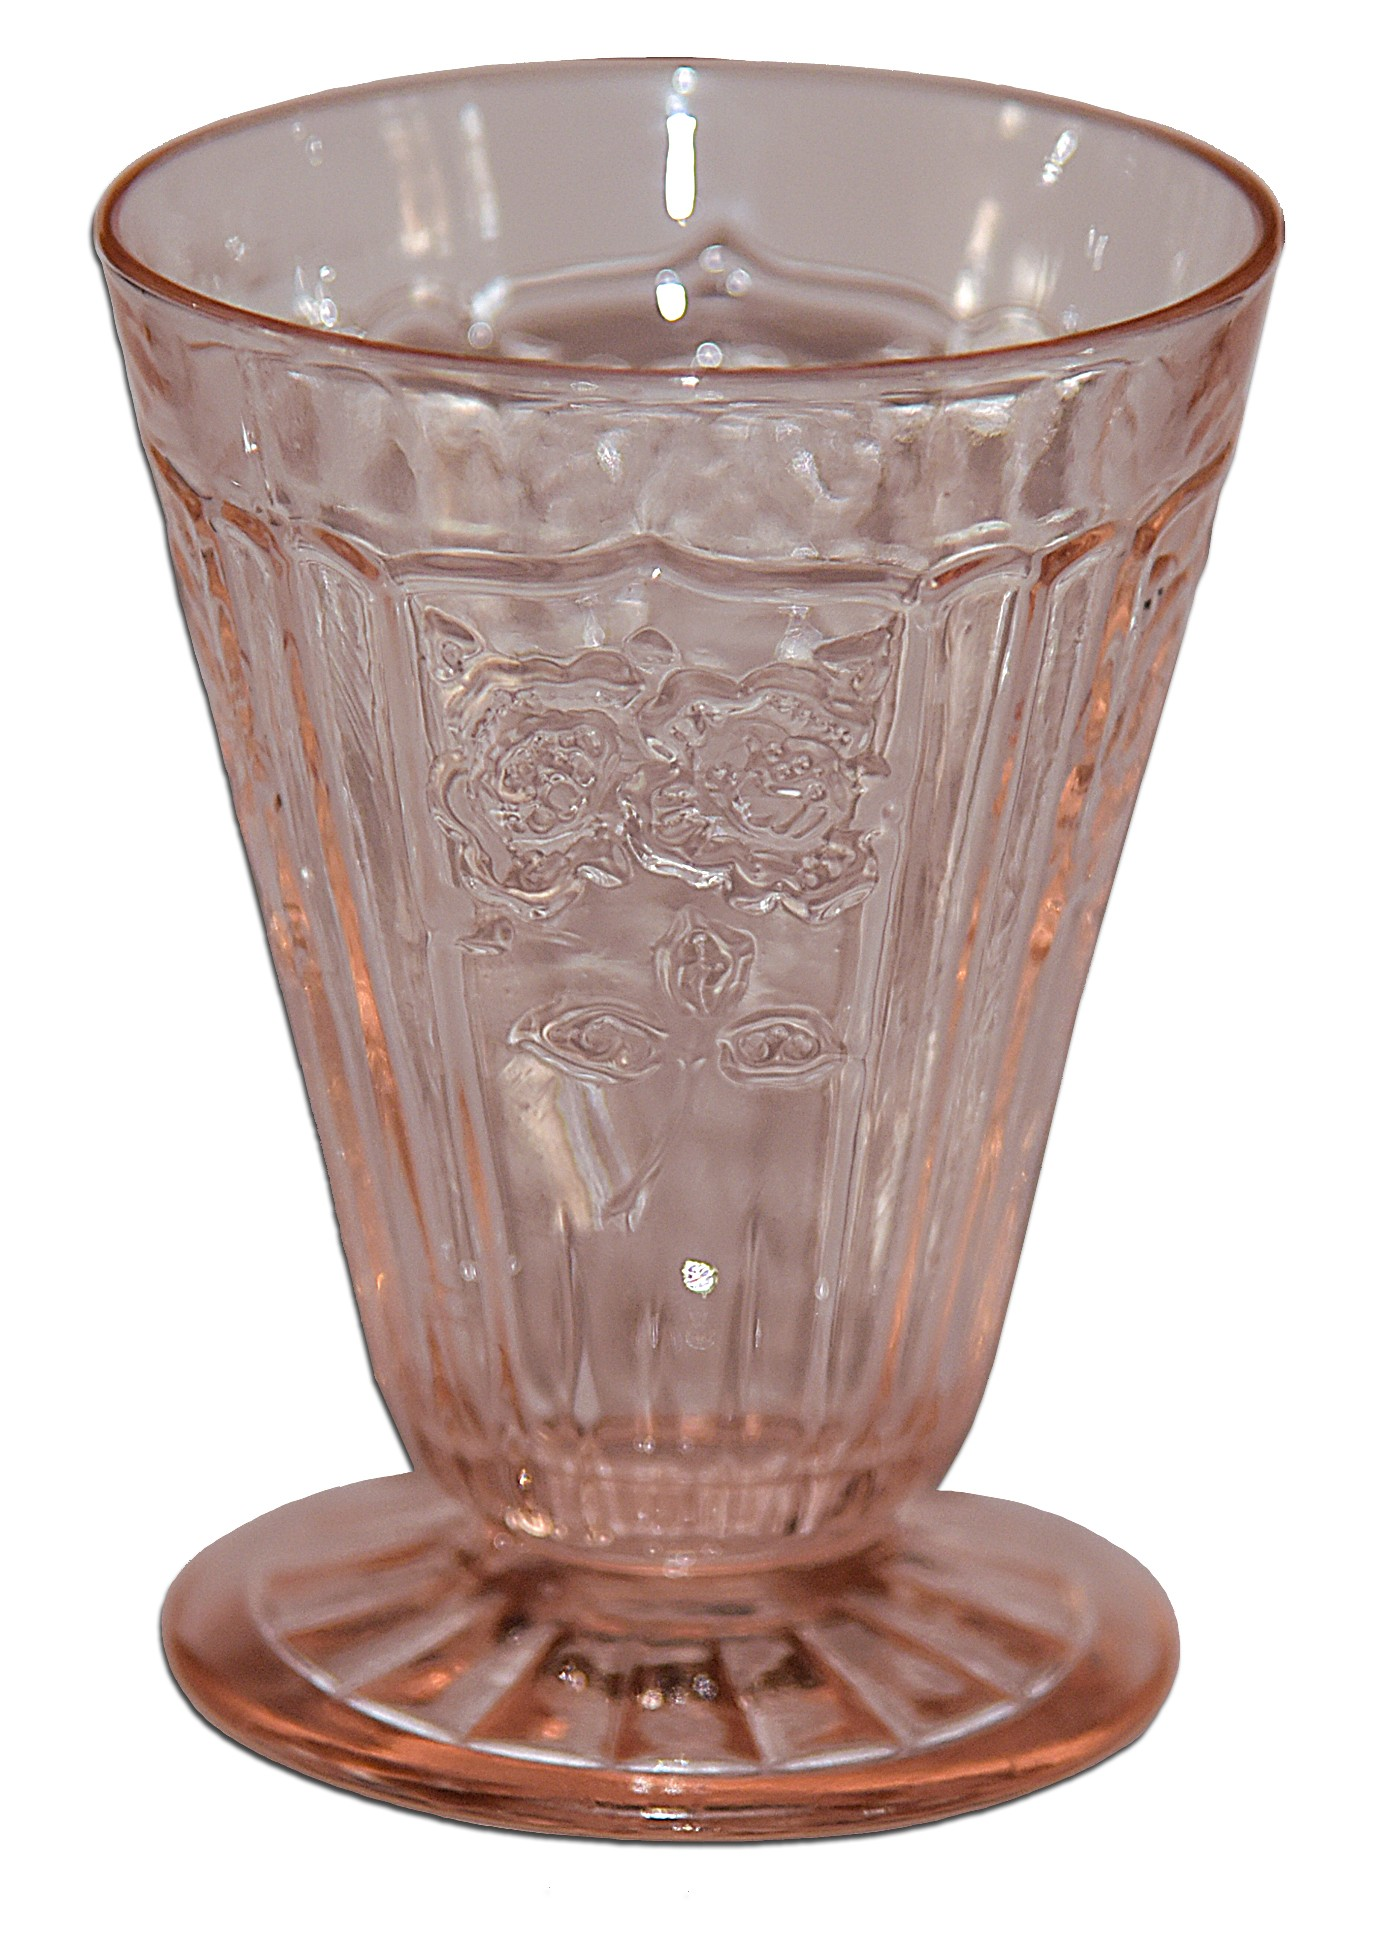 Hocking Mayfair Pink Footed Juice Tumbler - Rayed Foot